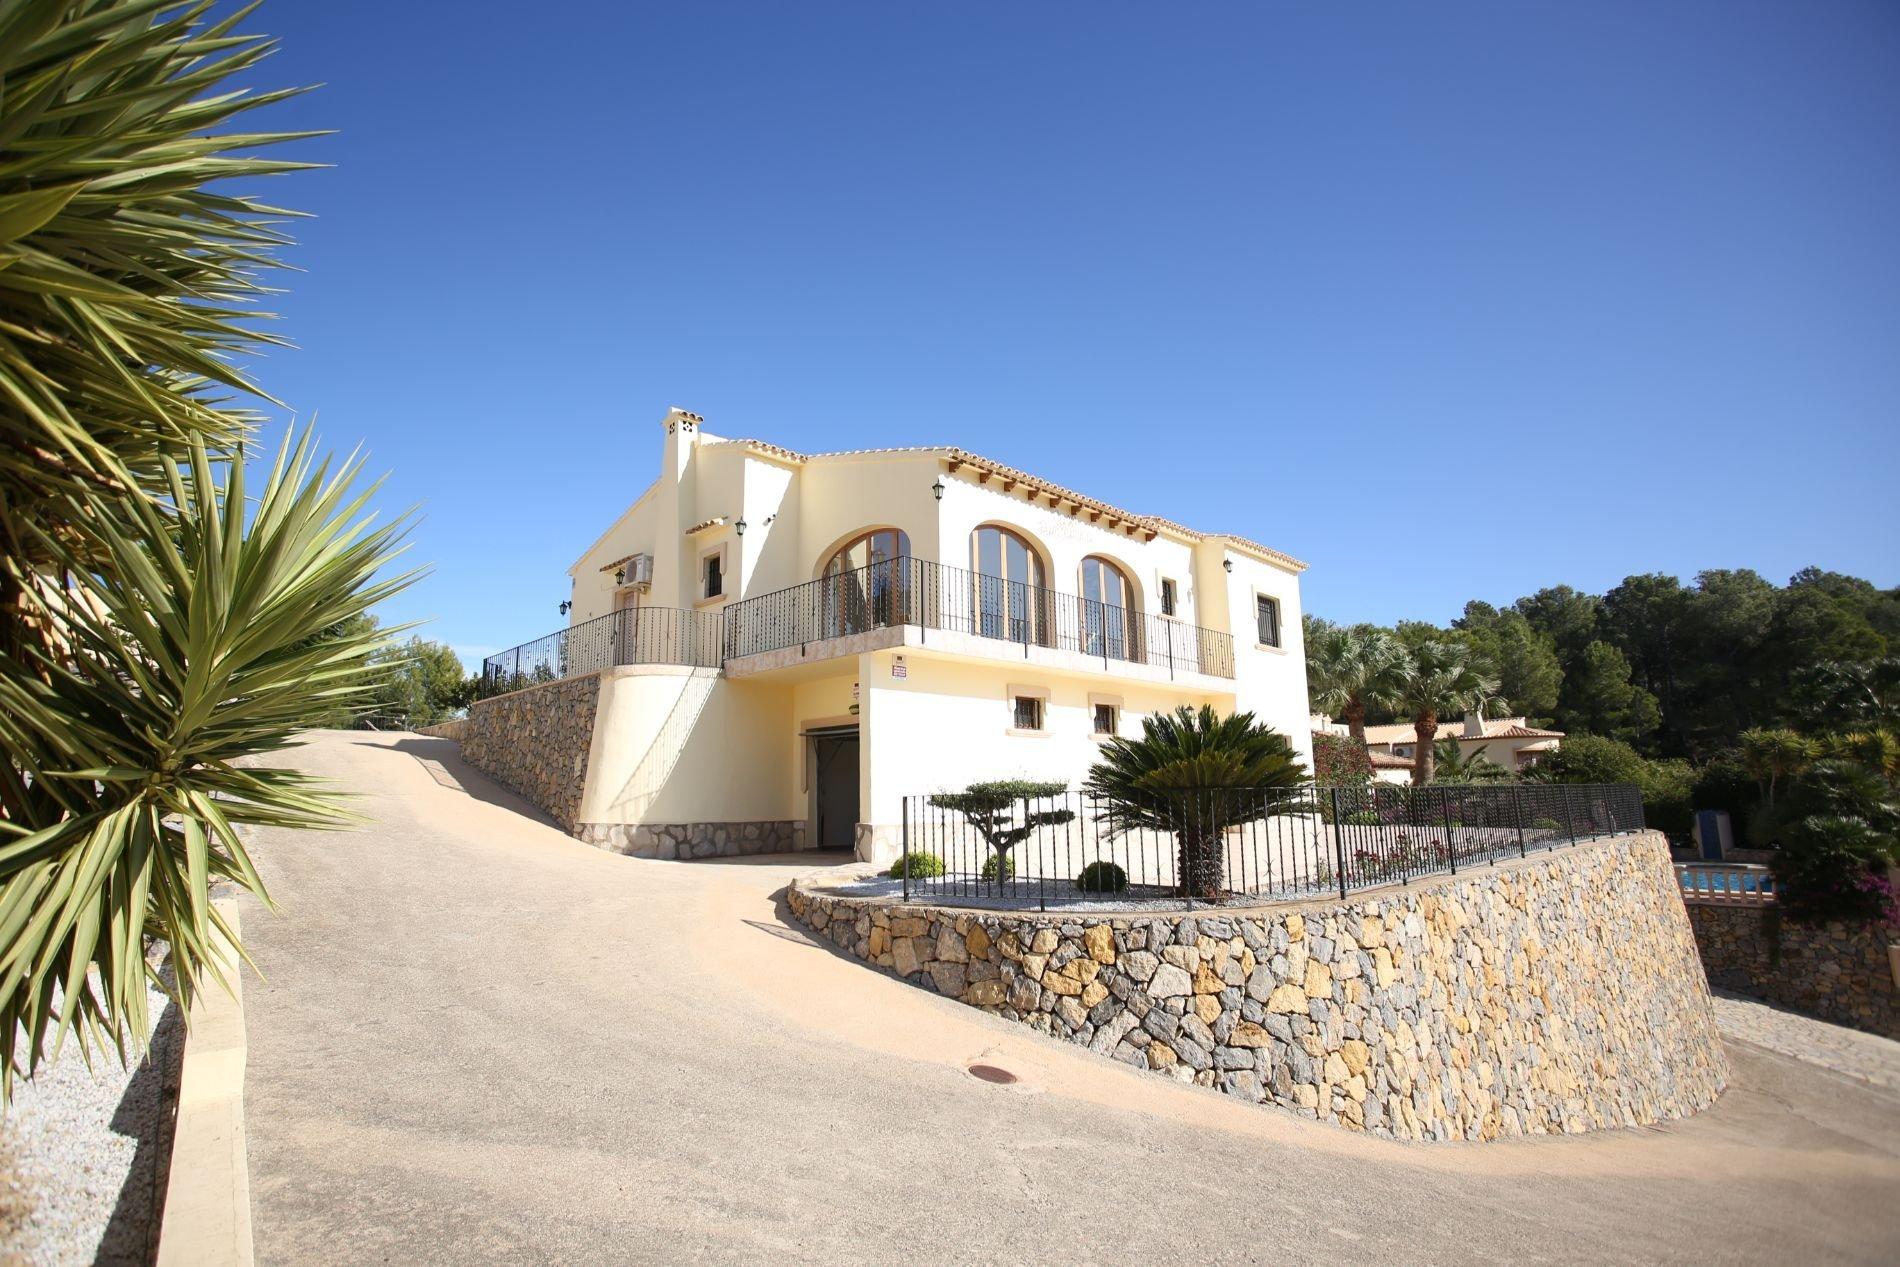 Spacious villa with impressive south facing views